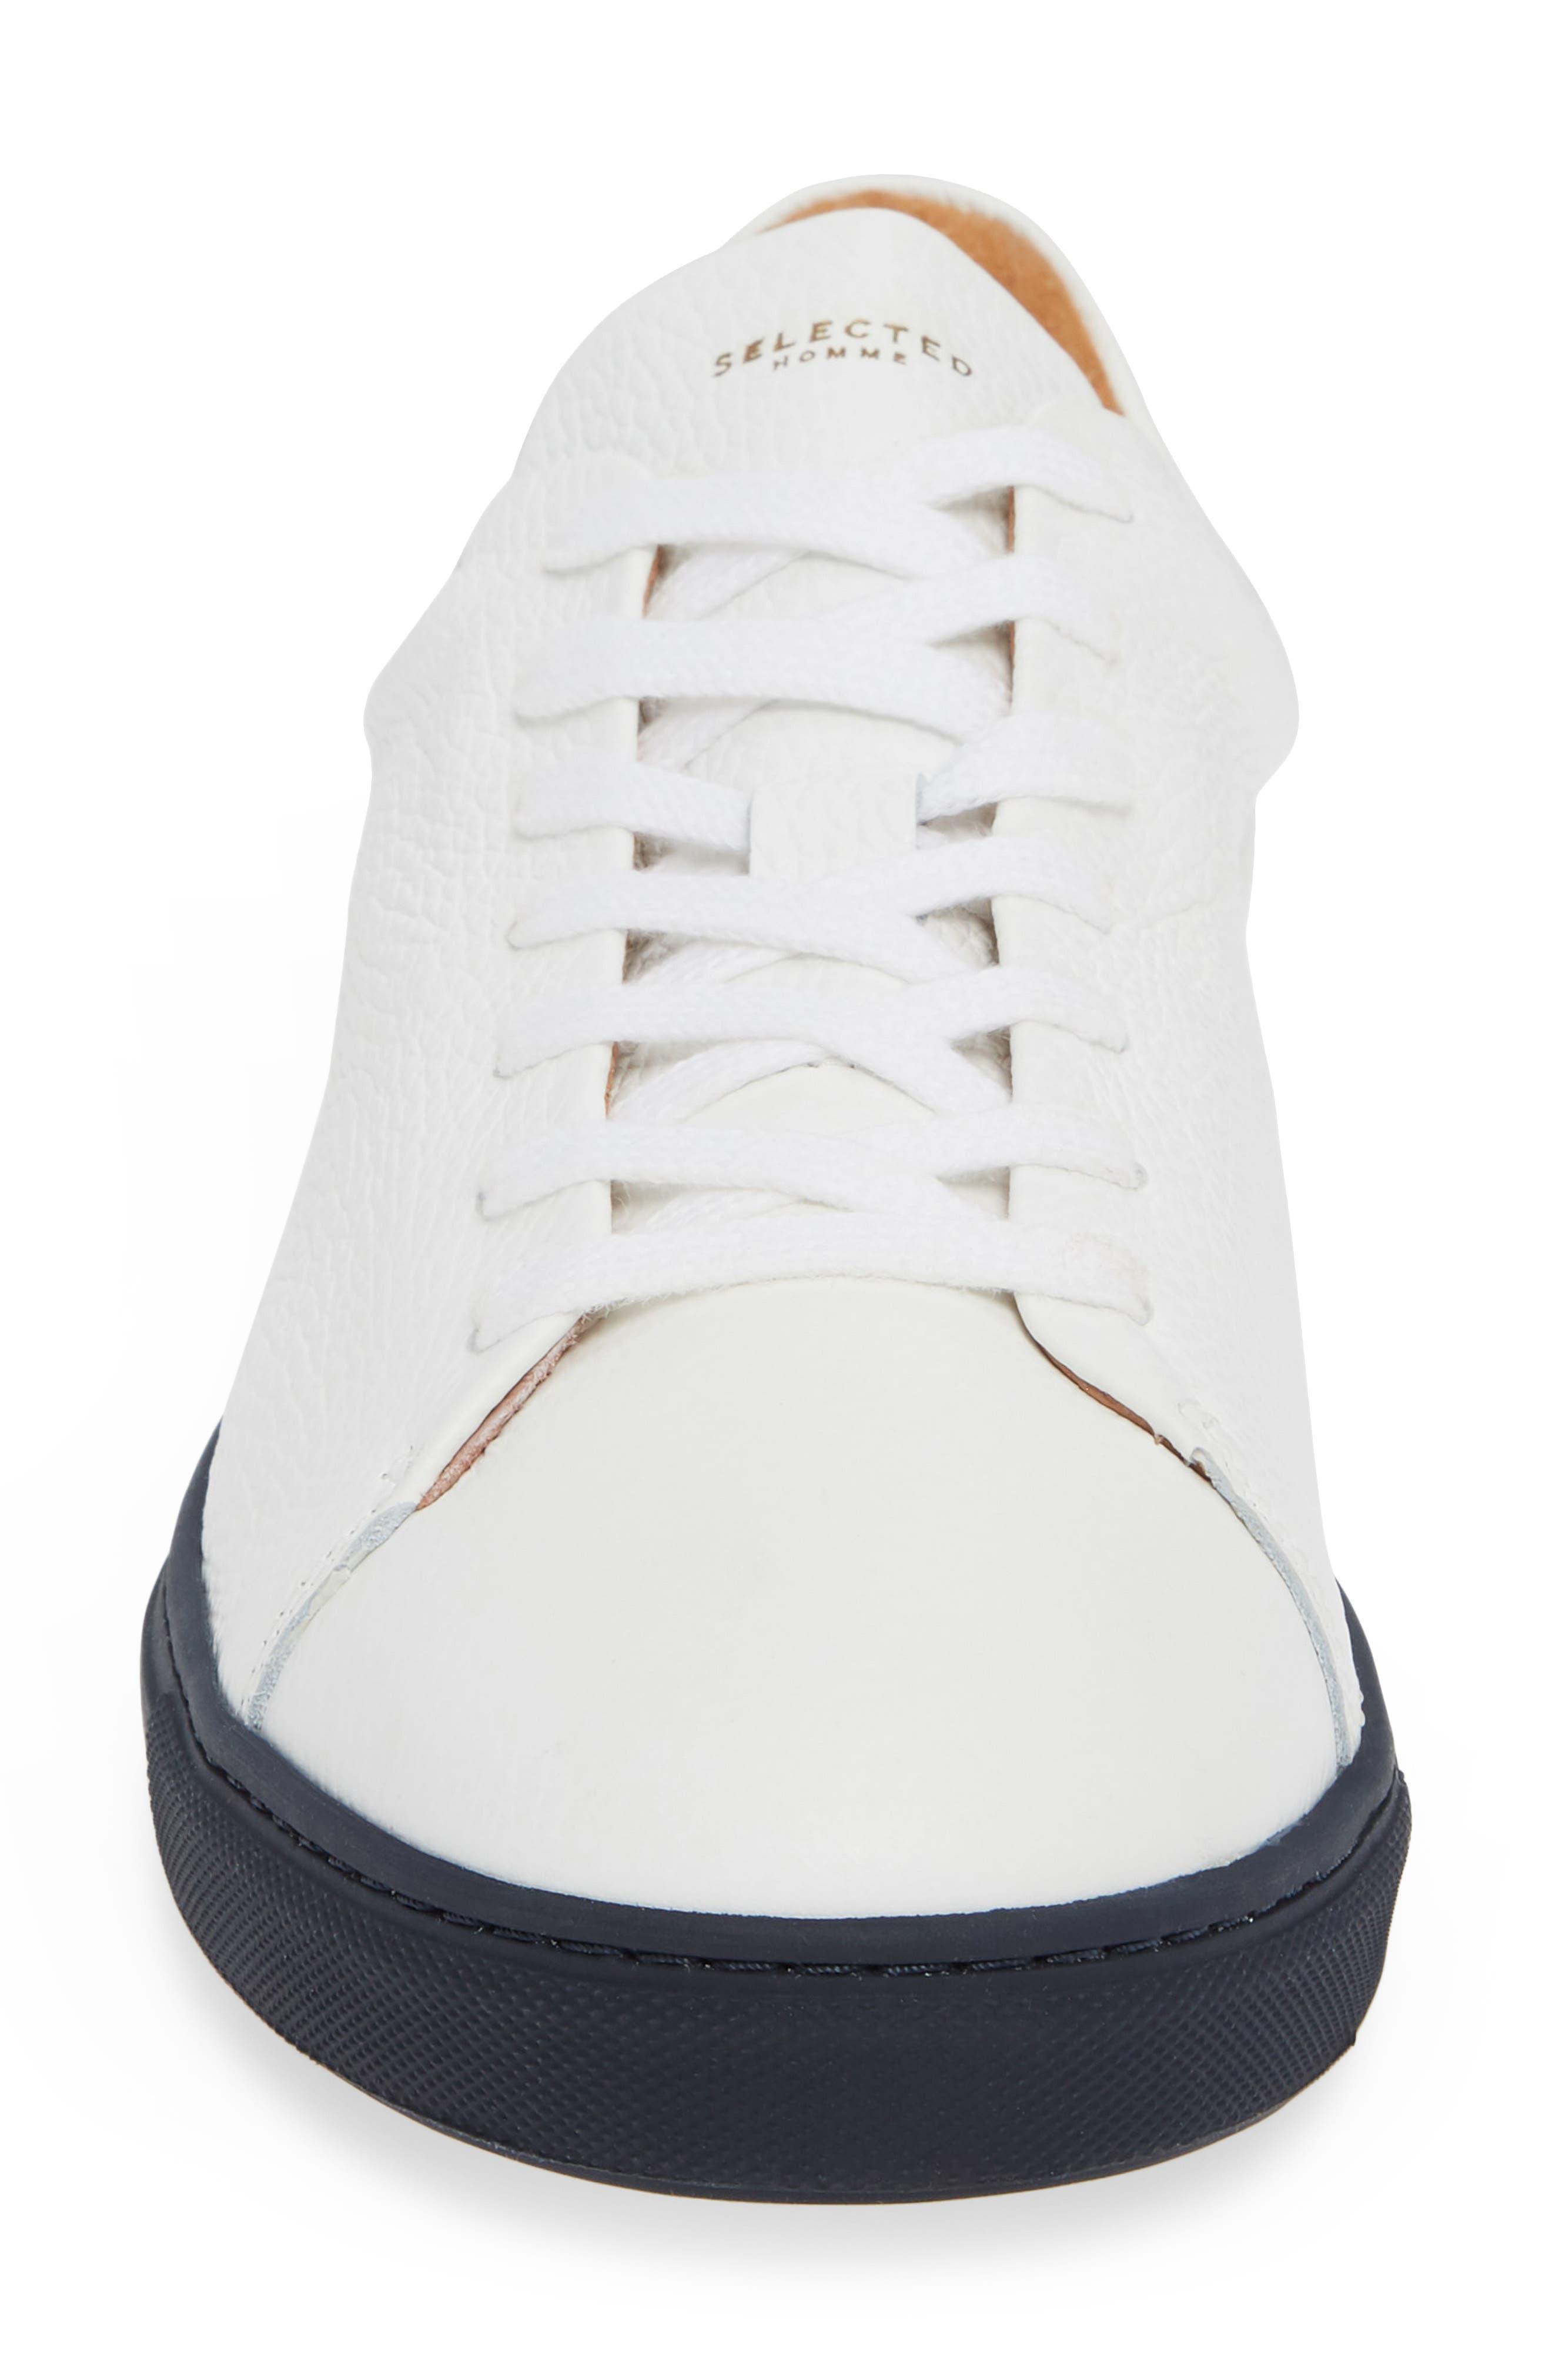 David Sneaker,                             Alternate thumbnail 4, color,                             WHITE/ DARK NAVY SOLE